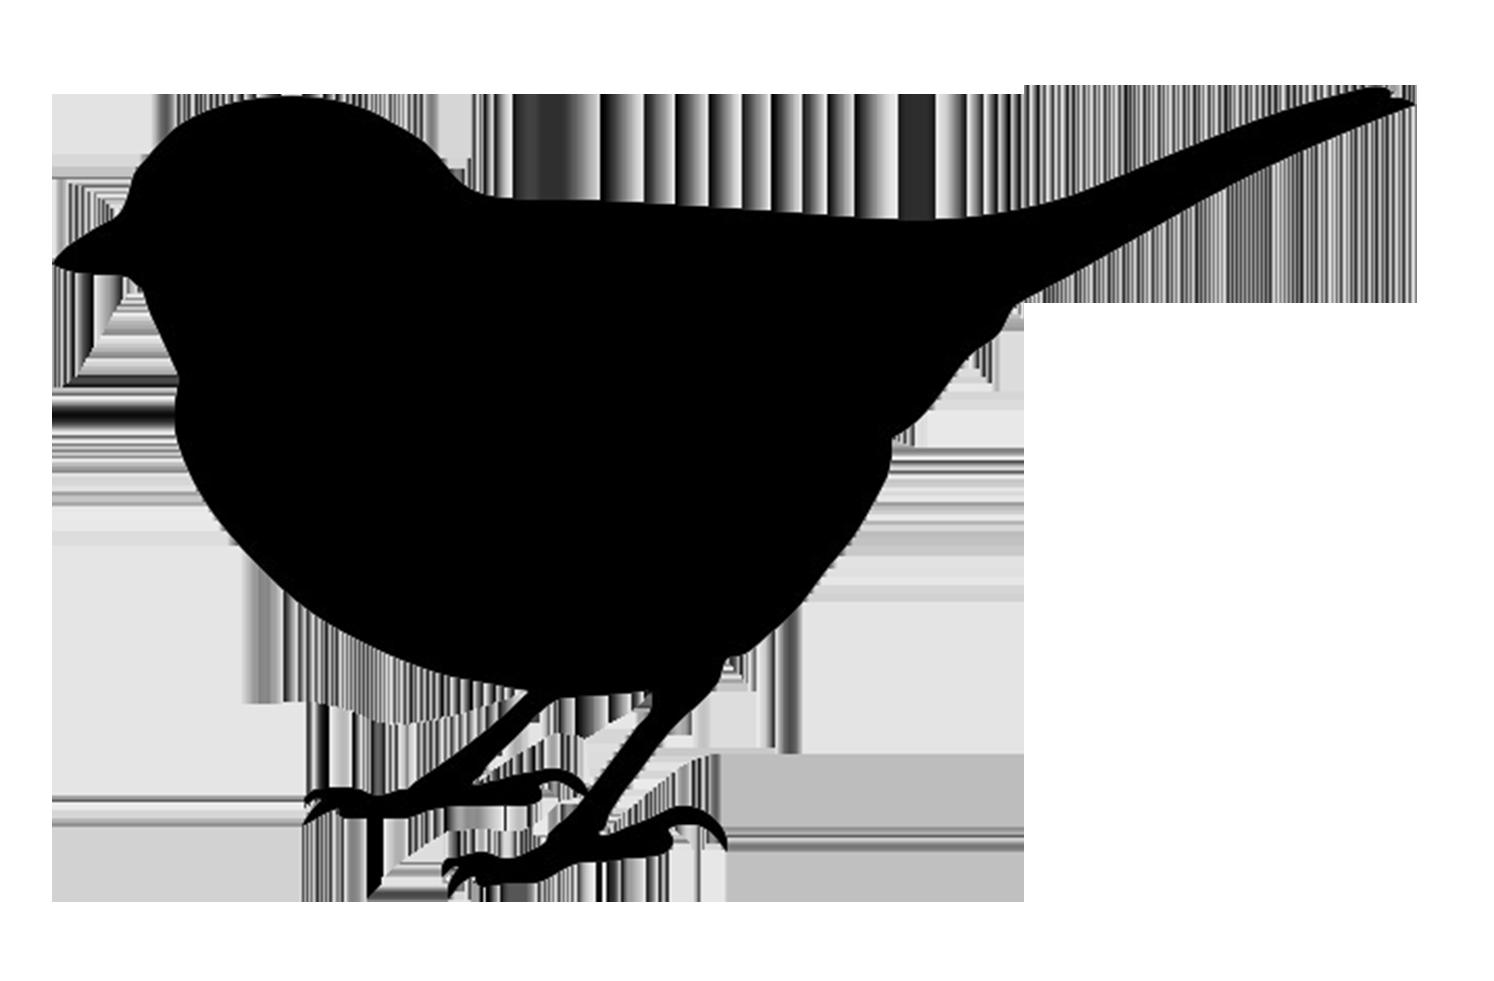 Bird Outline PNG HD - 127203